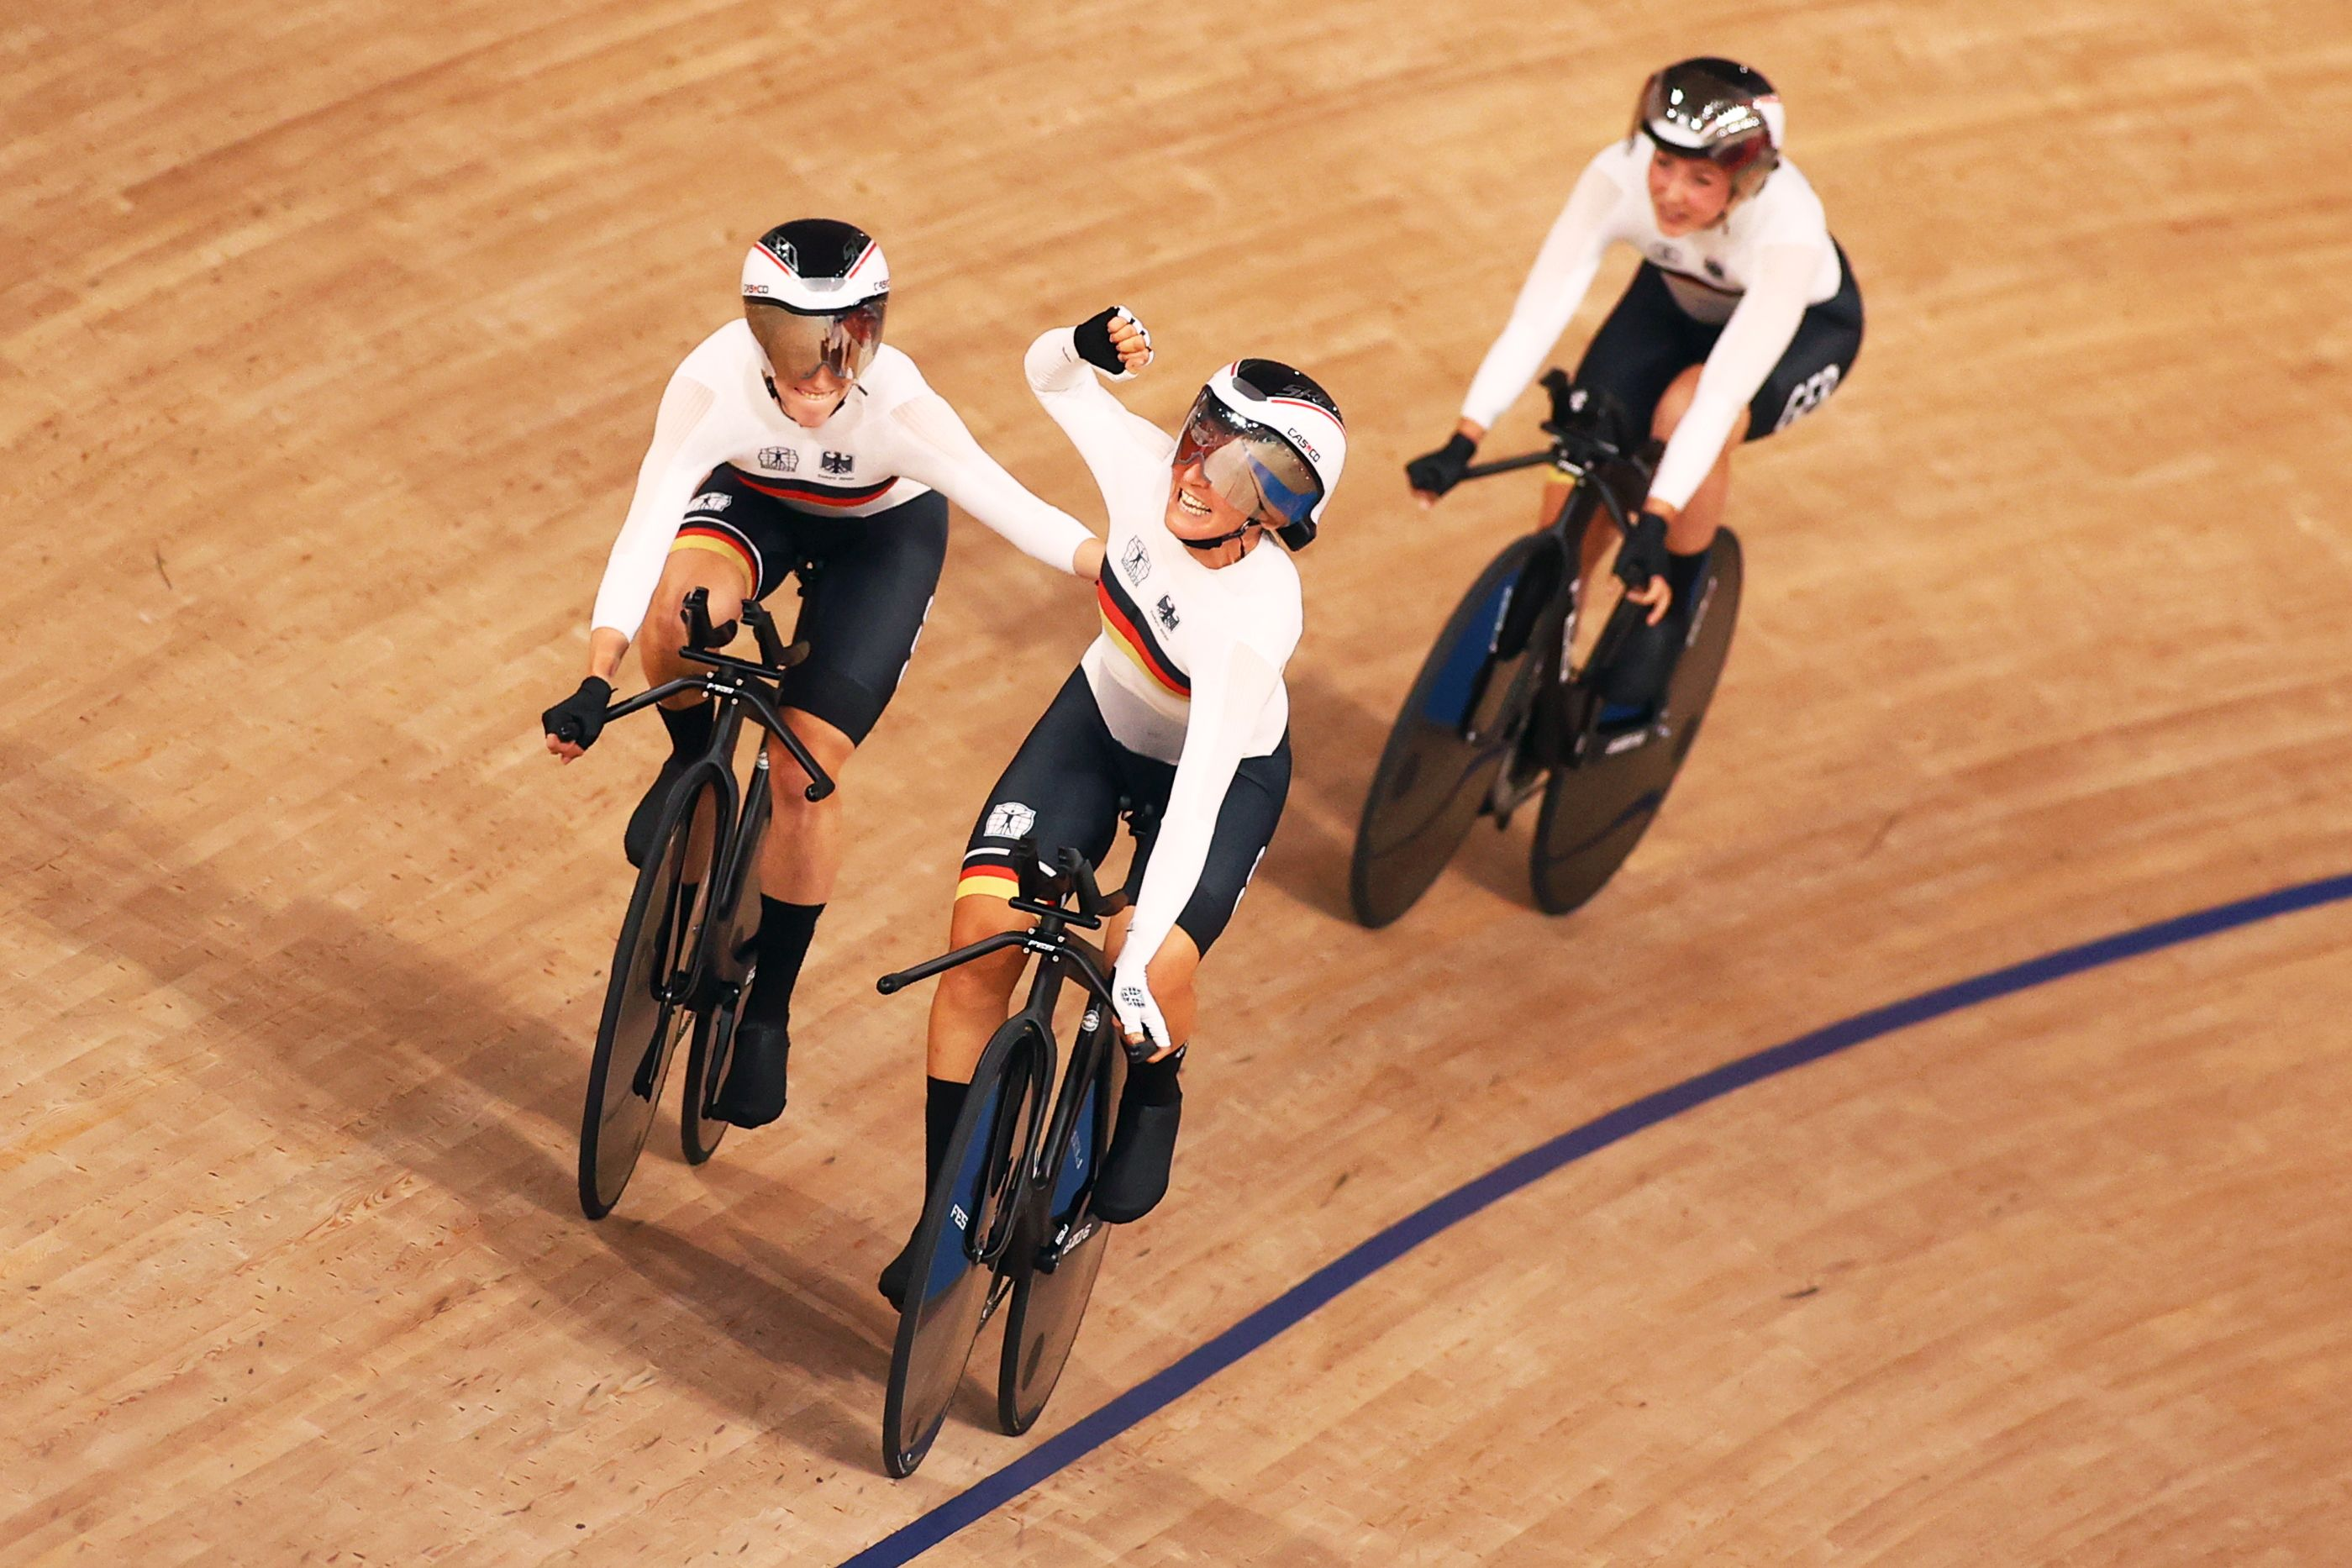 Tokyo 2020 Olympics - Cycling - Track - Women's Team Pursuit - Gold Final - Izu Velodrome, Shizuoka, Japan - August 3, 2021.  Team Germany celebrate winning gold. REUTERS/Matthew Childs